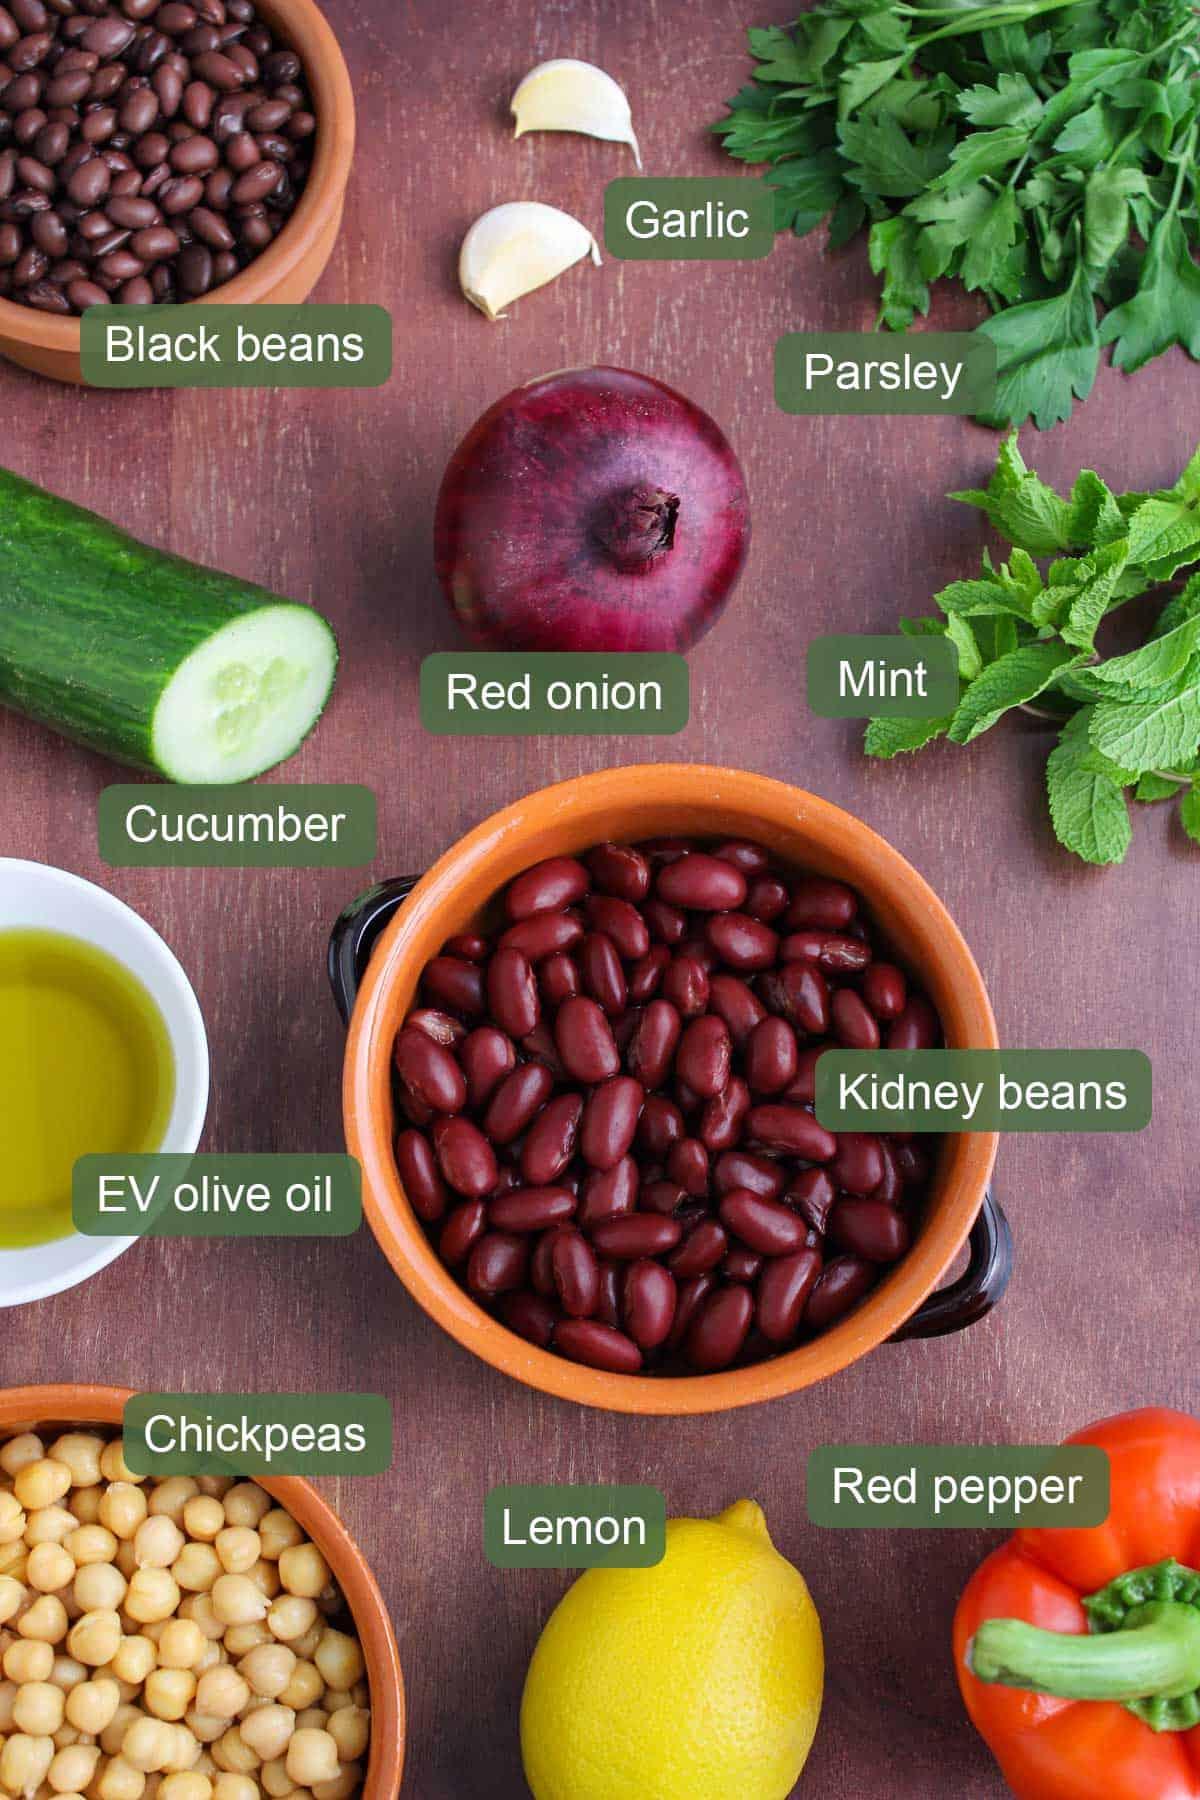 List of Ingredients to Make Three-Bean Salad